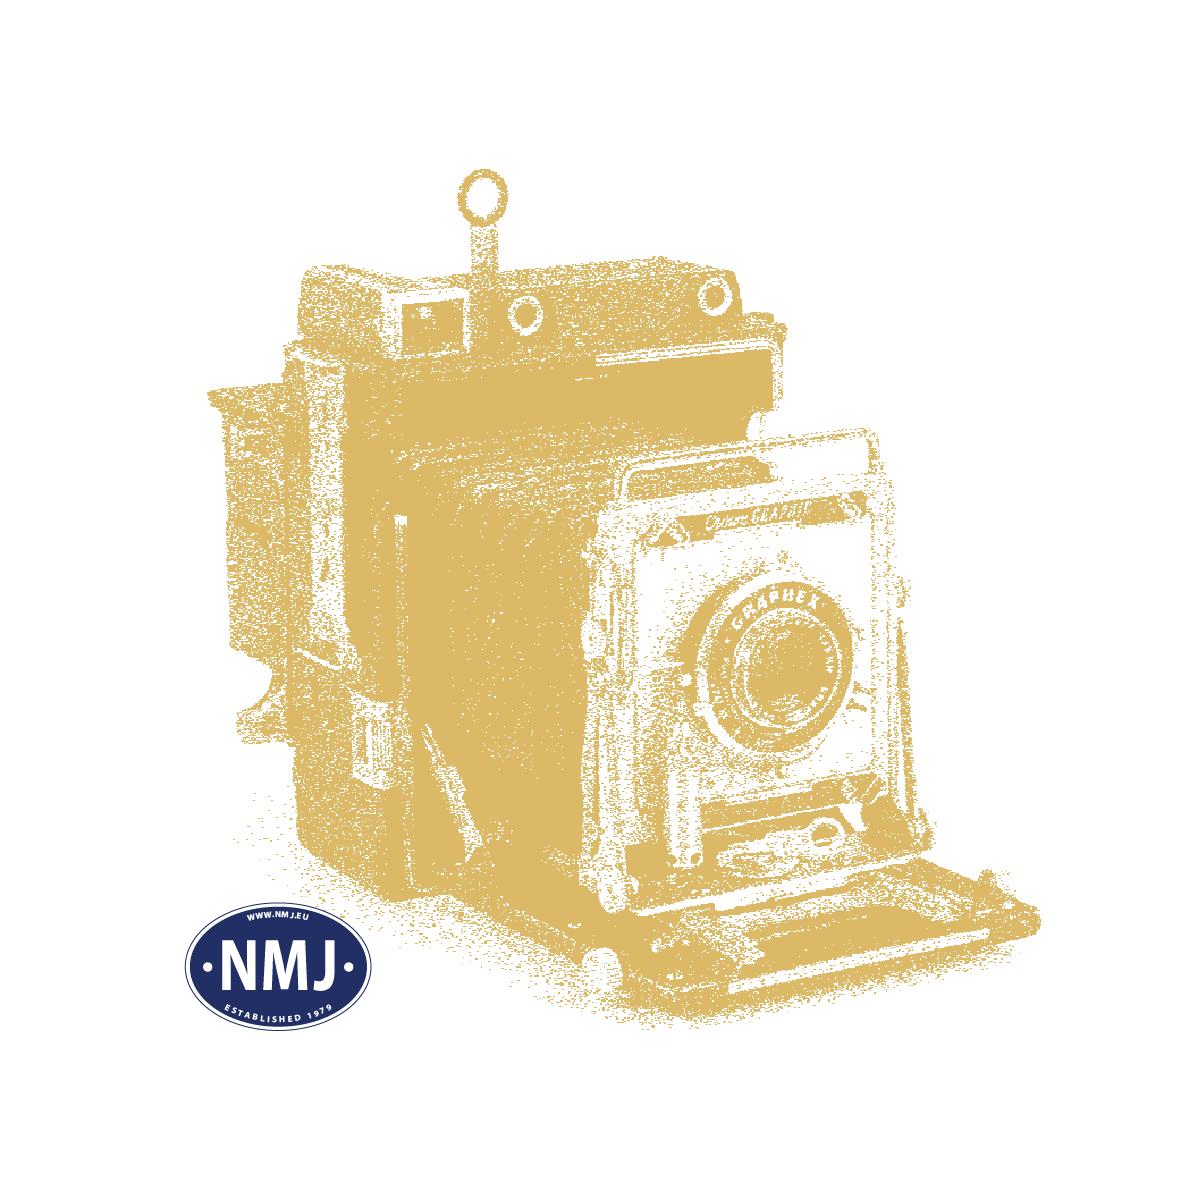 MIN717-24S - Gresstuster, Kort utgave, Sen Høst, H0